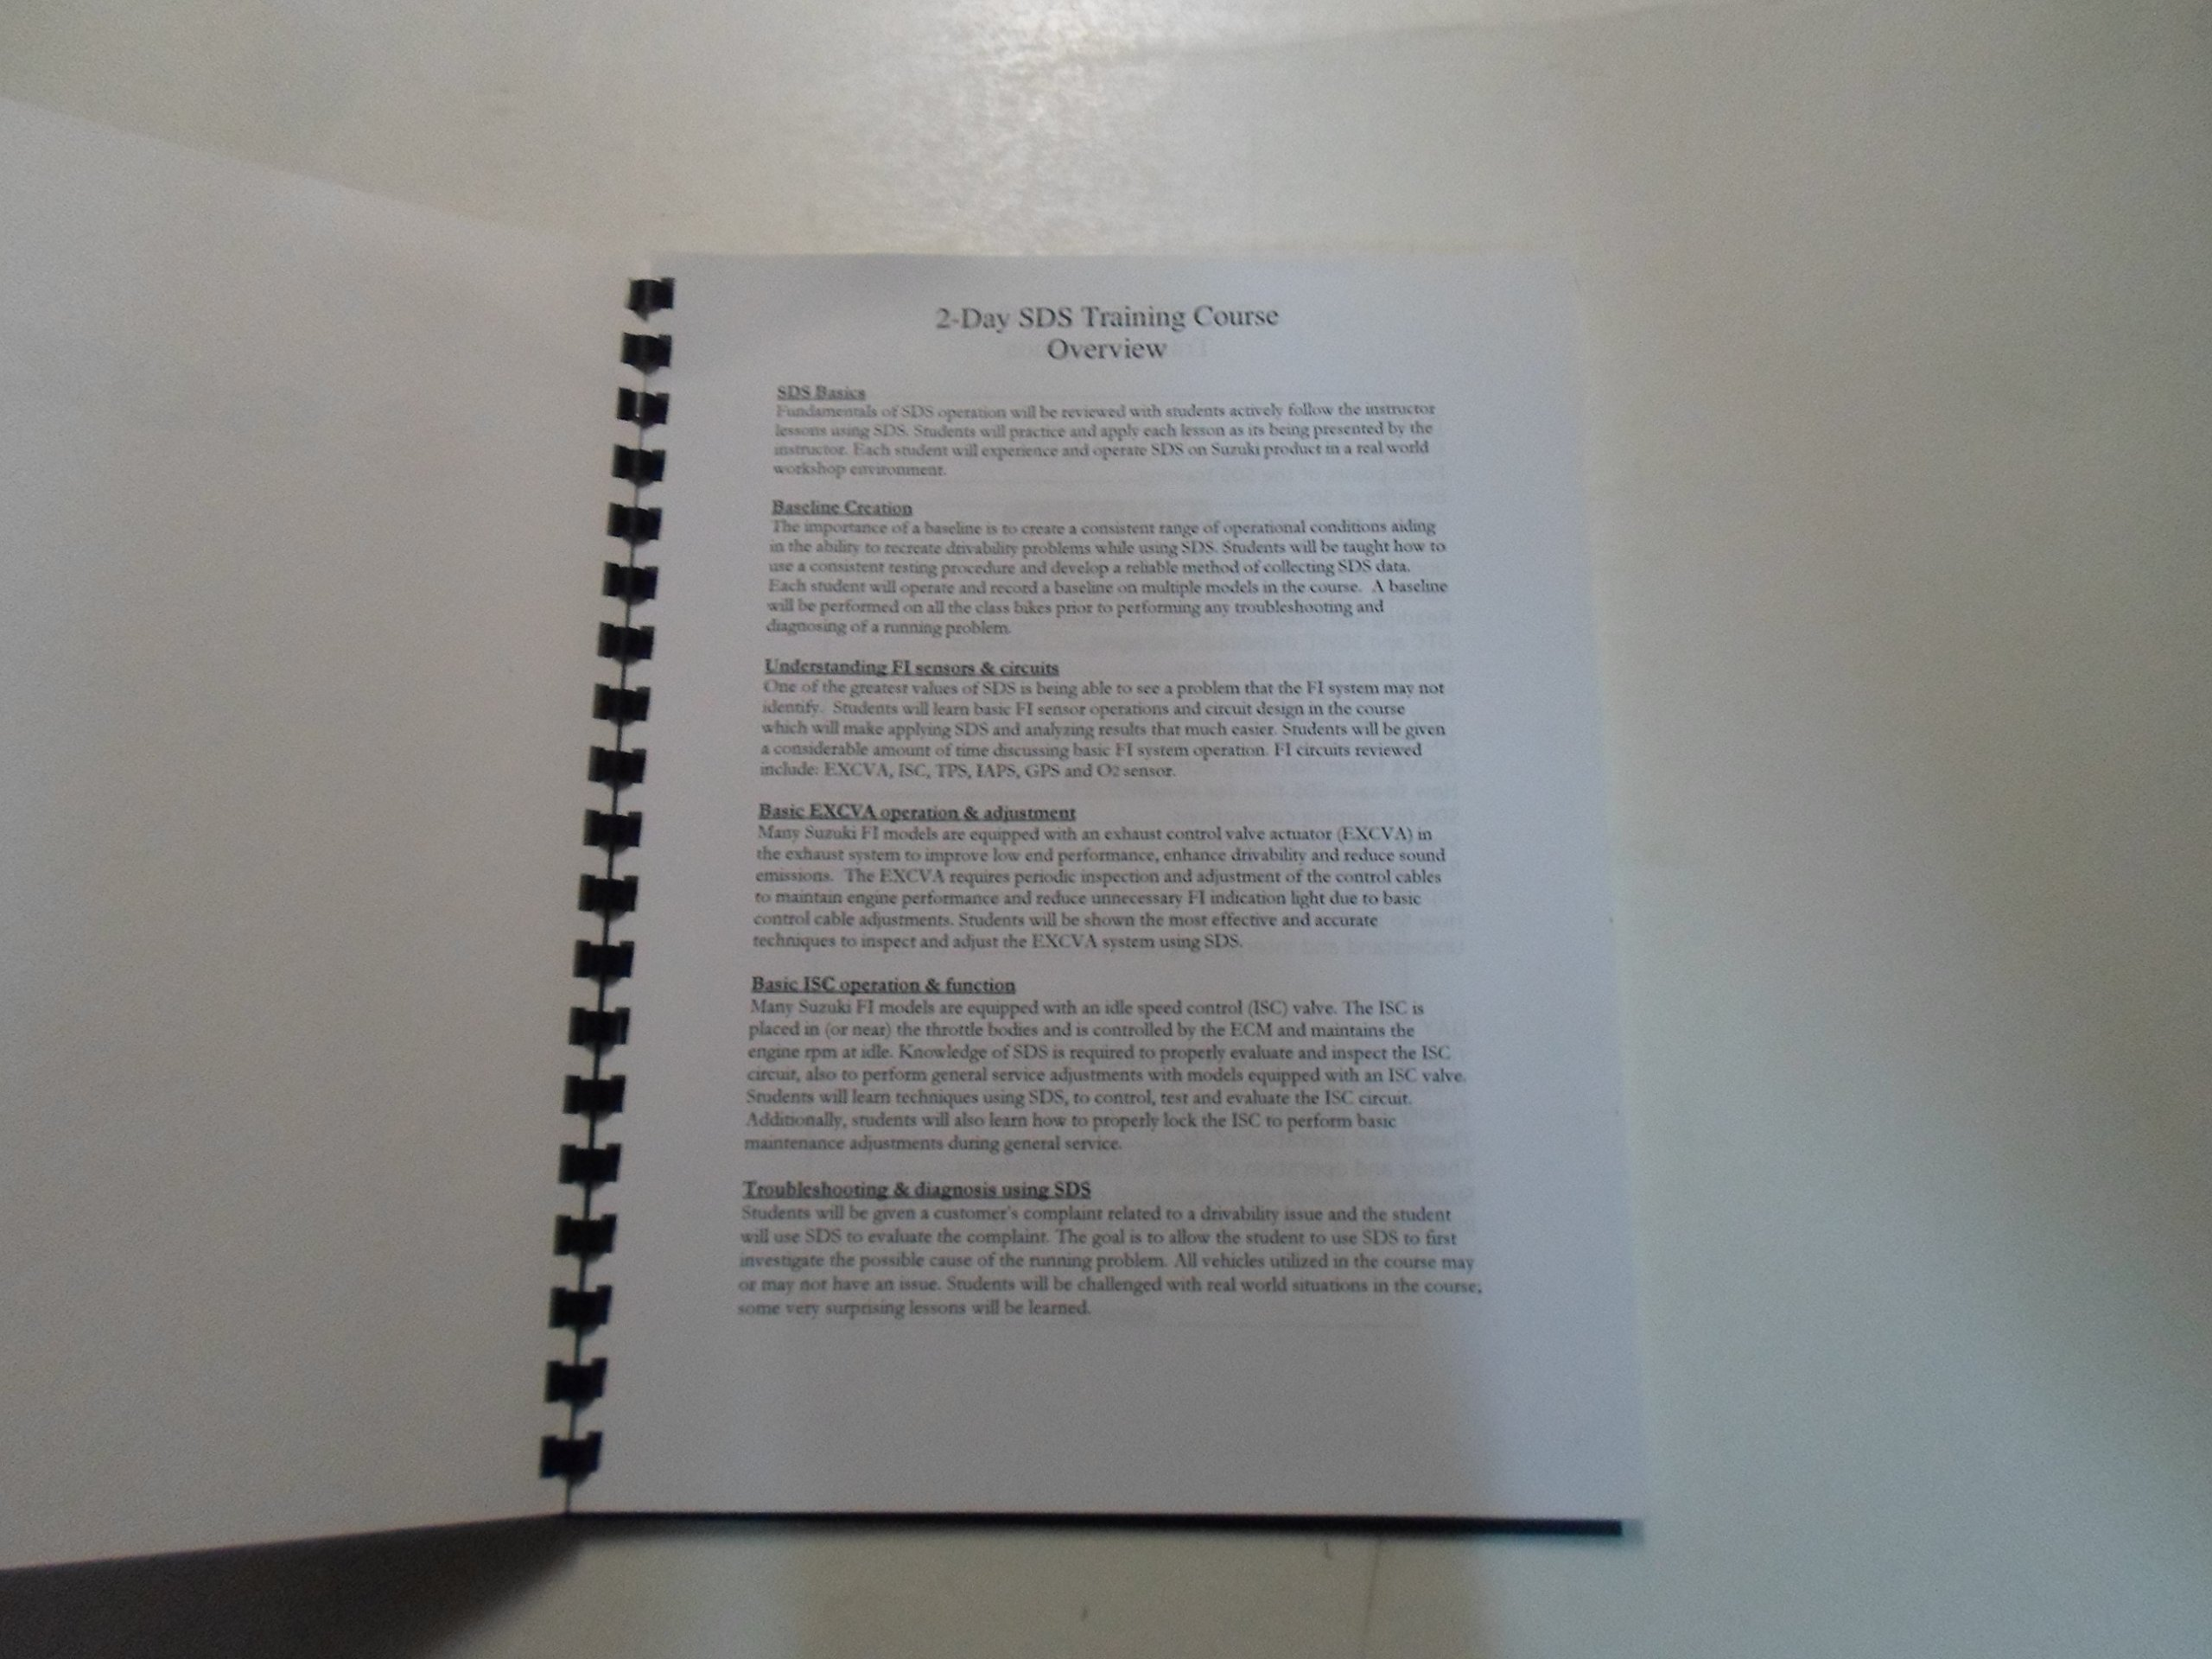 Suzuki Diagnostic System Technical Training Course Manual